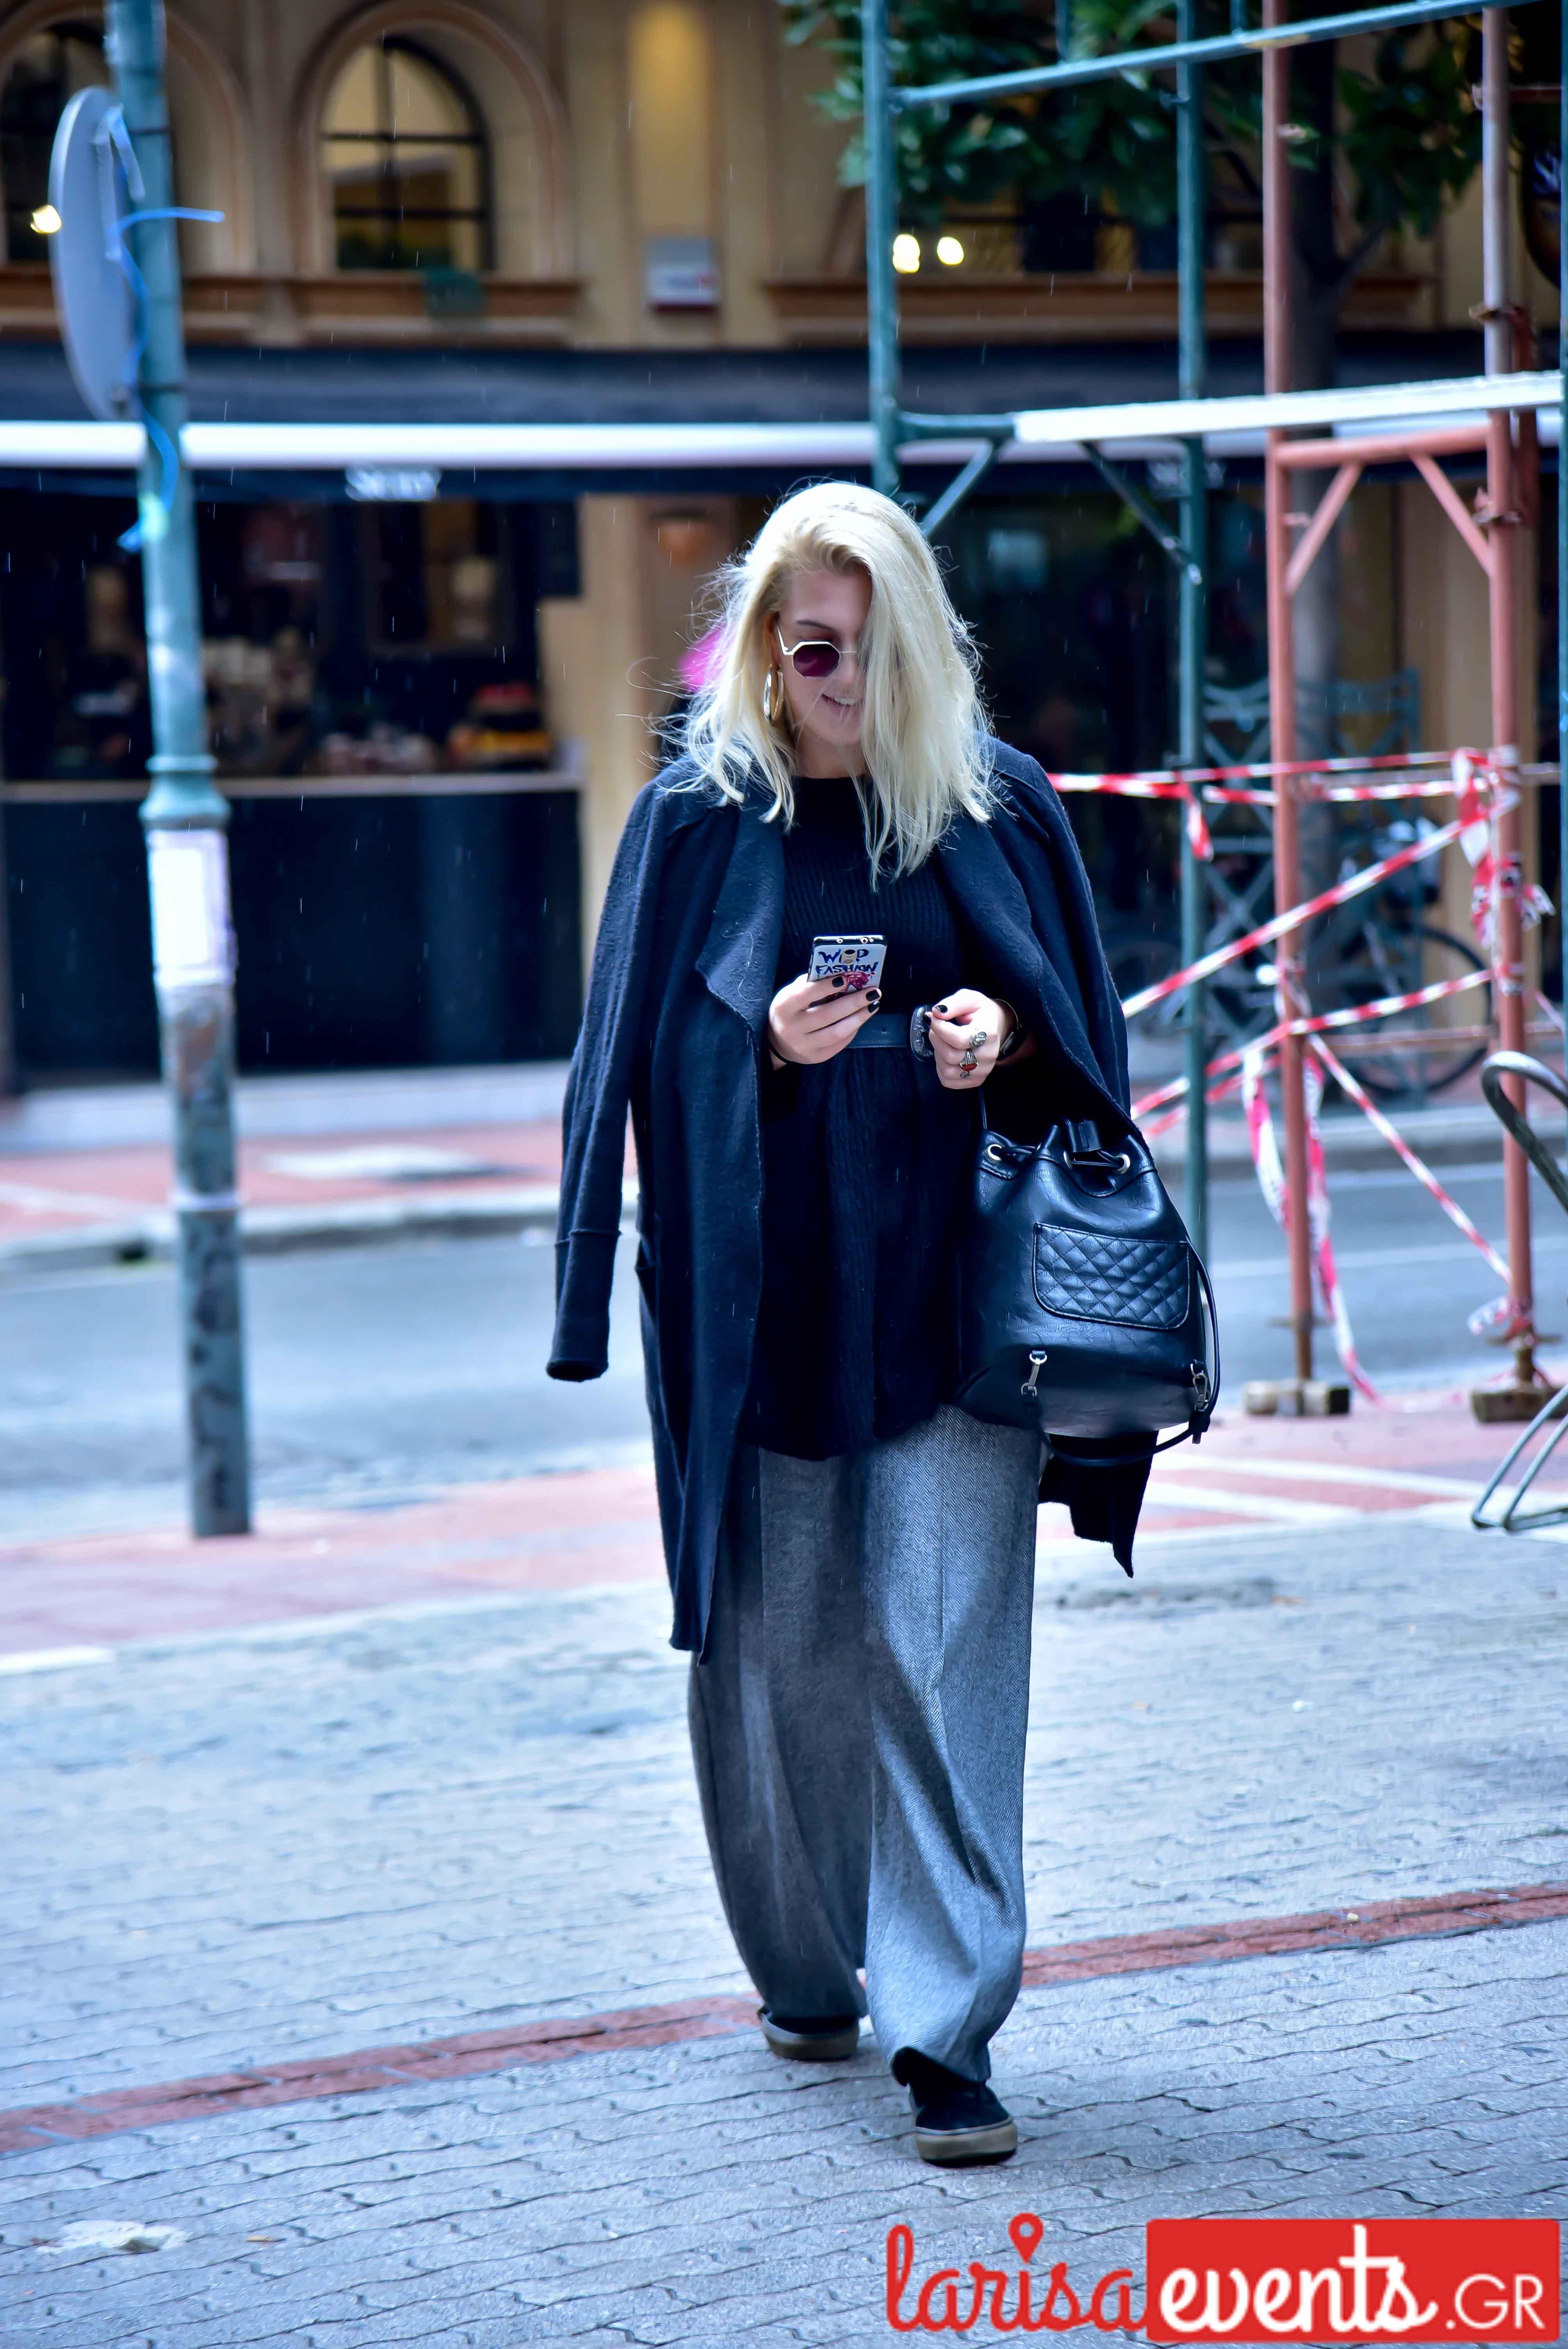 LAZ 6722 1 - Λάρισα's Street Style | Οι Λαρισαίοι σε street style clicks!